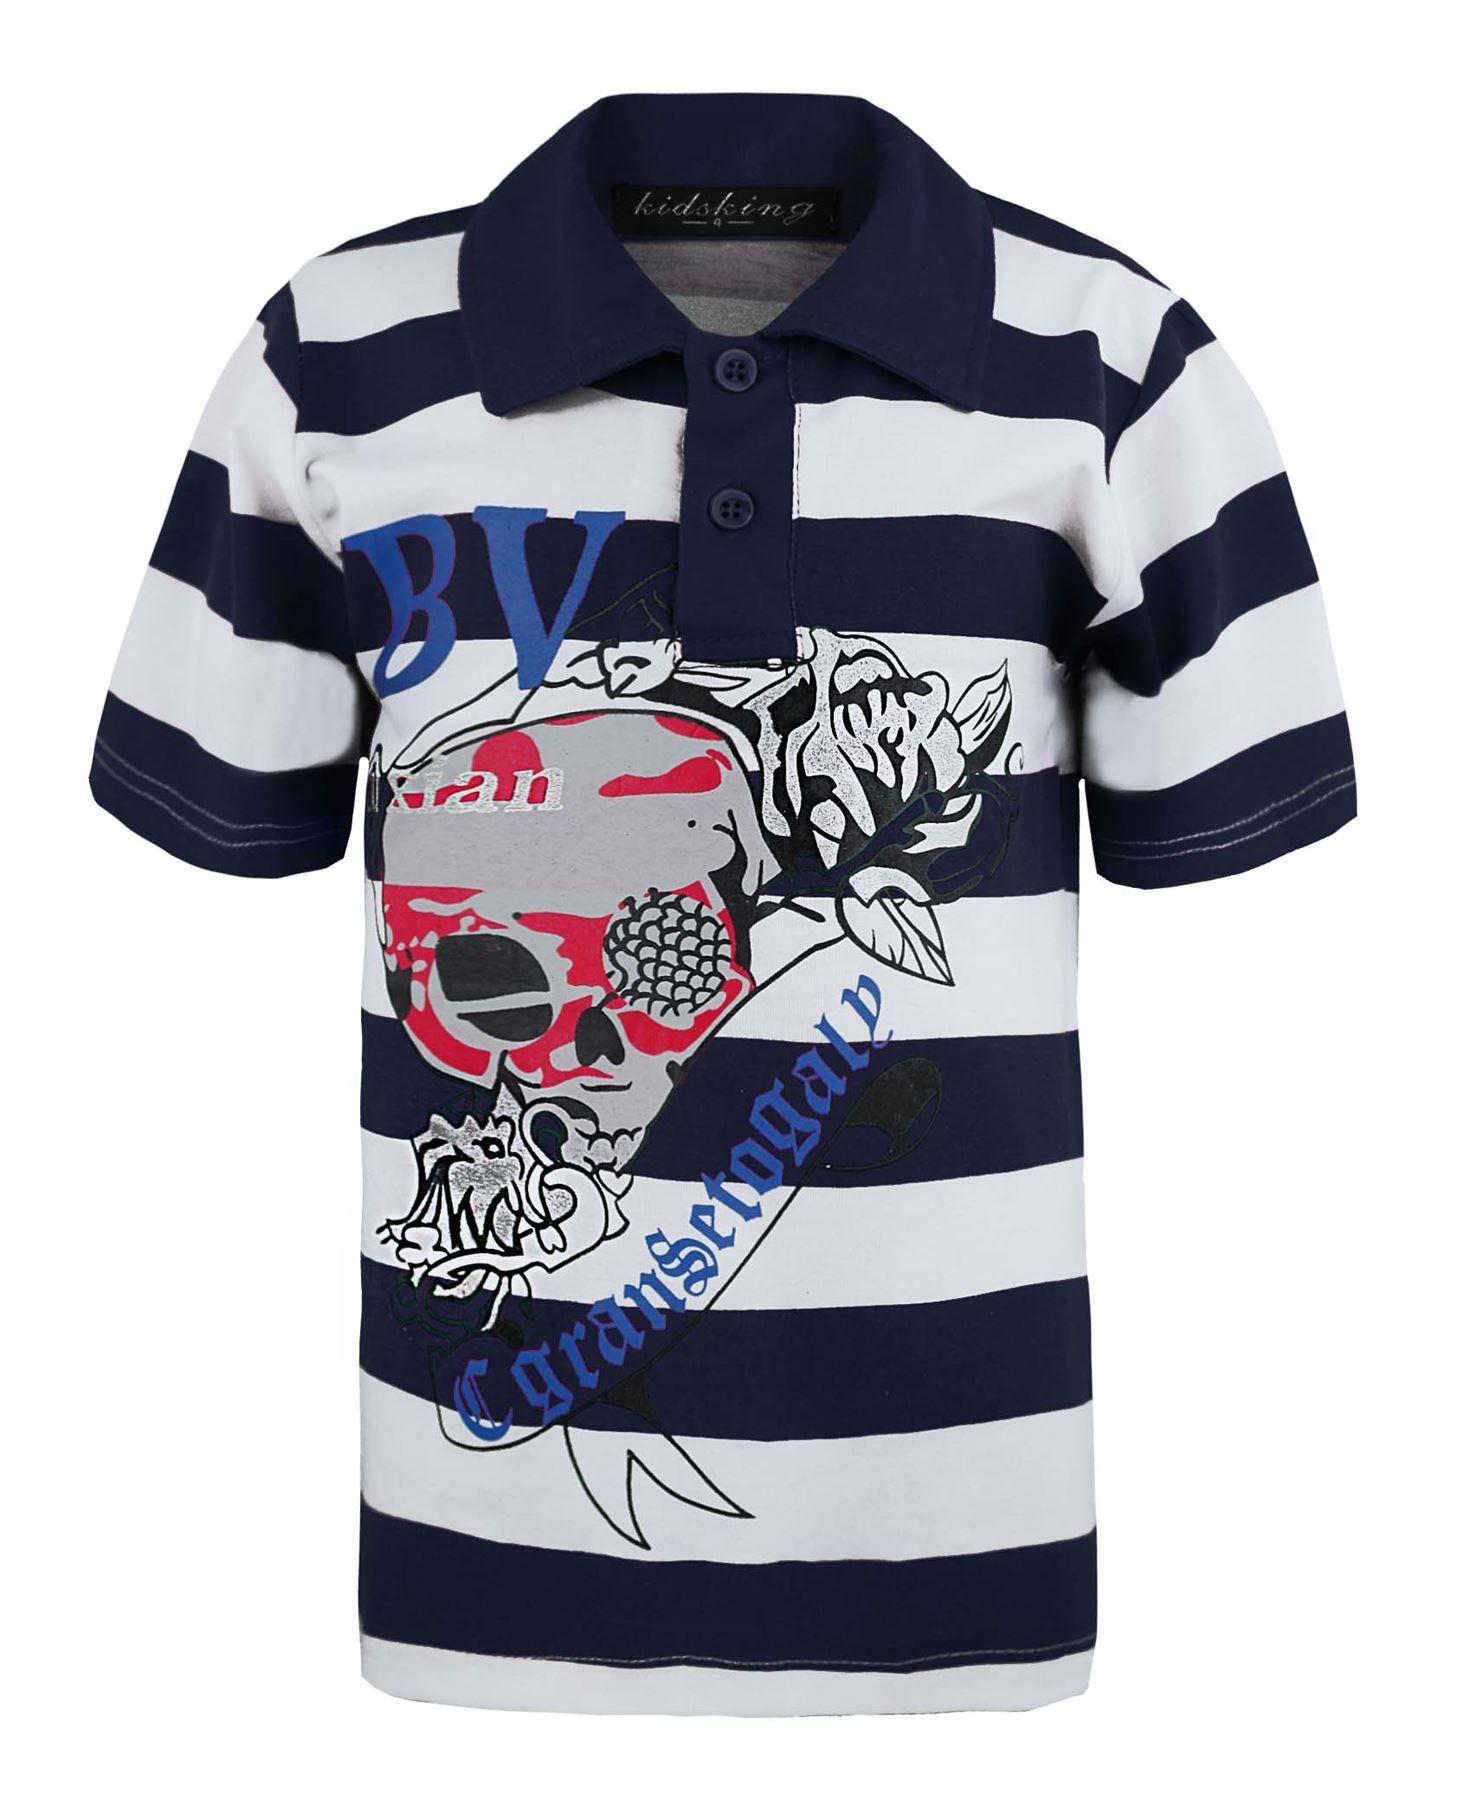 Kids shimmering skull print t shirt boys girls stripy polo for 7 year old boy shirt size